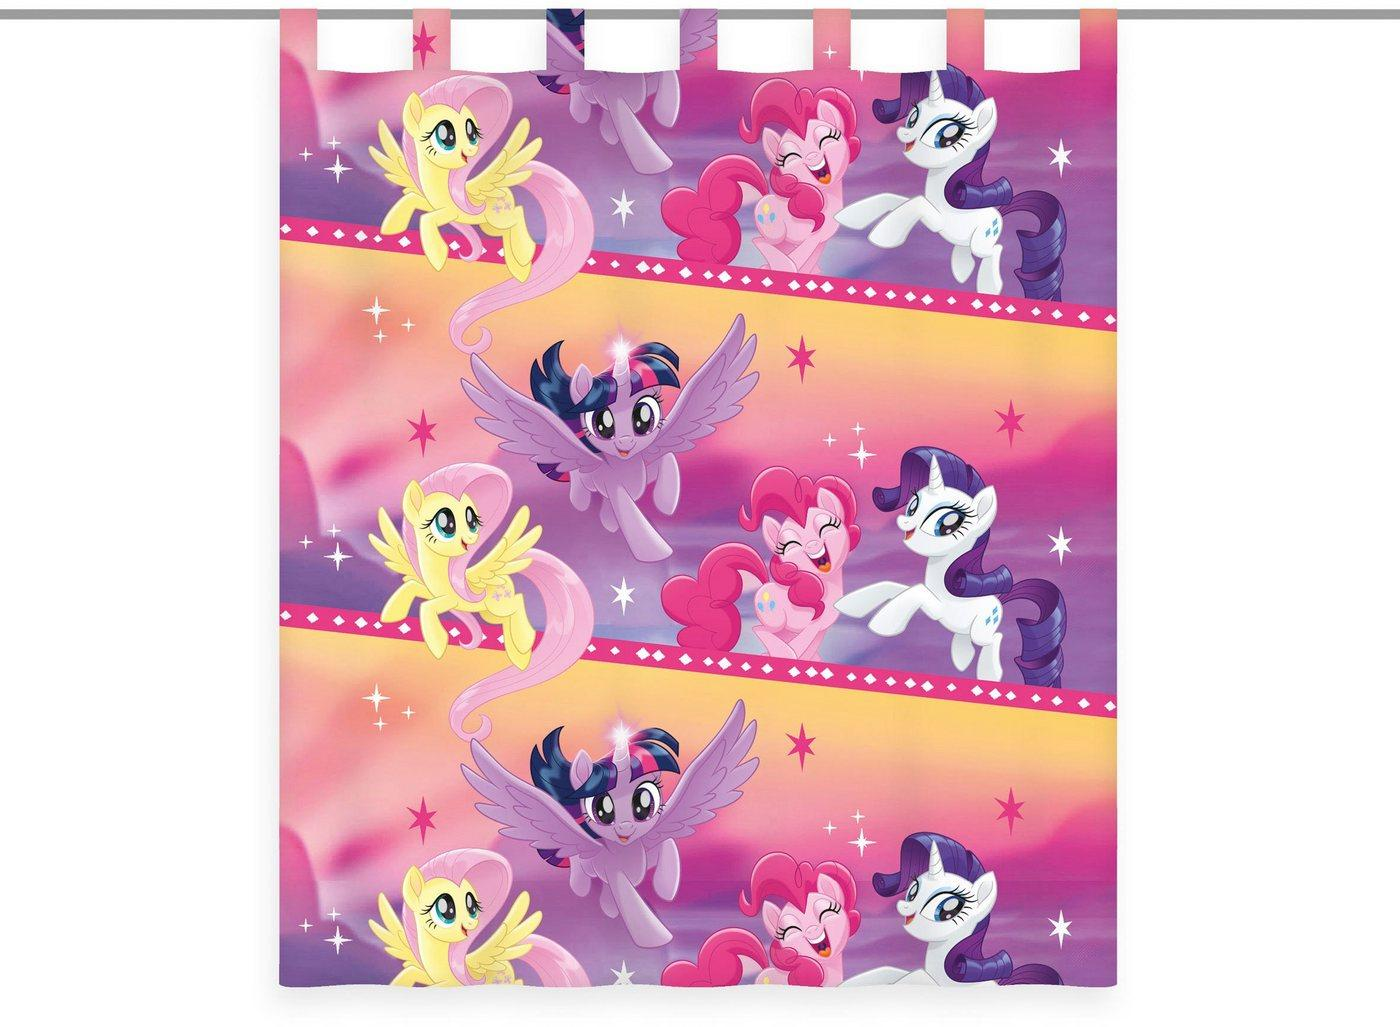 Vorhang »My little Pony«, My Little Pony, Schlaufen (1 Stück), My little pony Vorhang